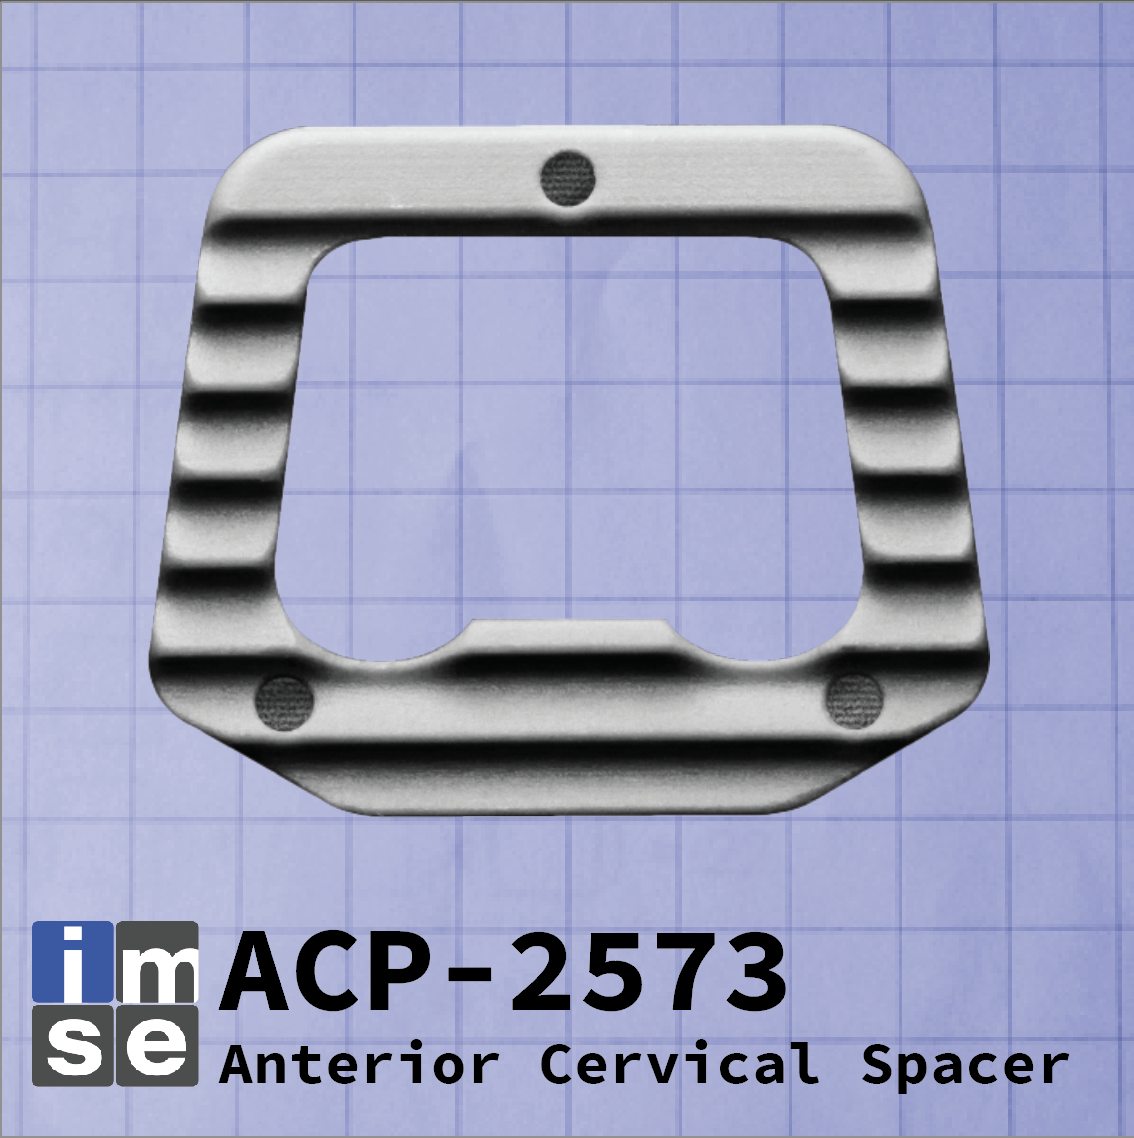 ACP-2573.png